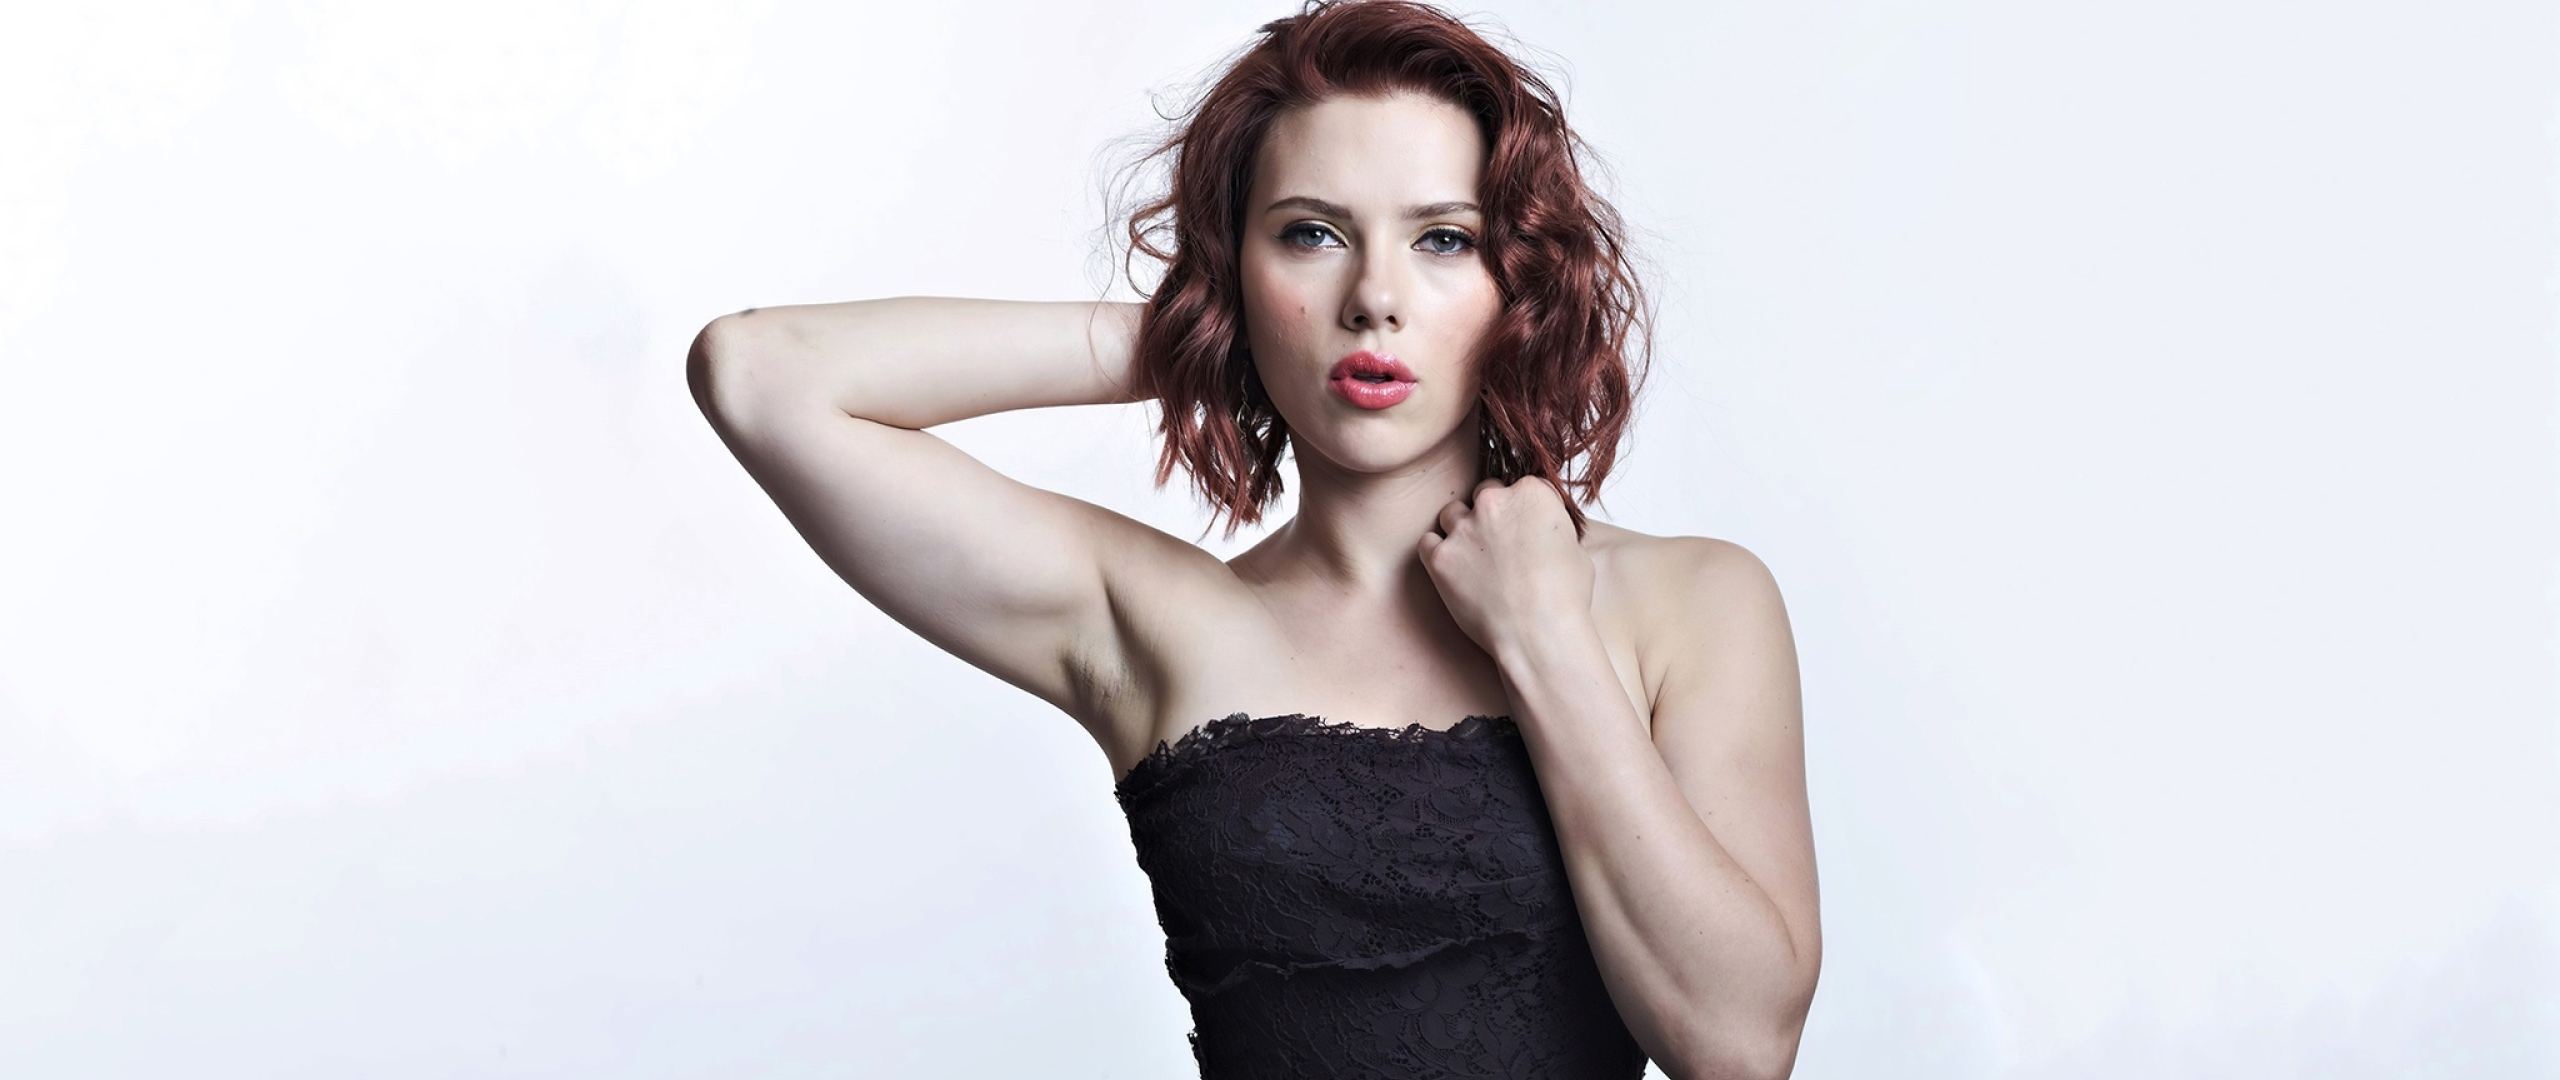 1280x2120 New Scarlett Johansson 2020 Photoshoot iPhone 6